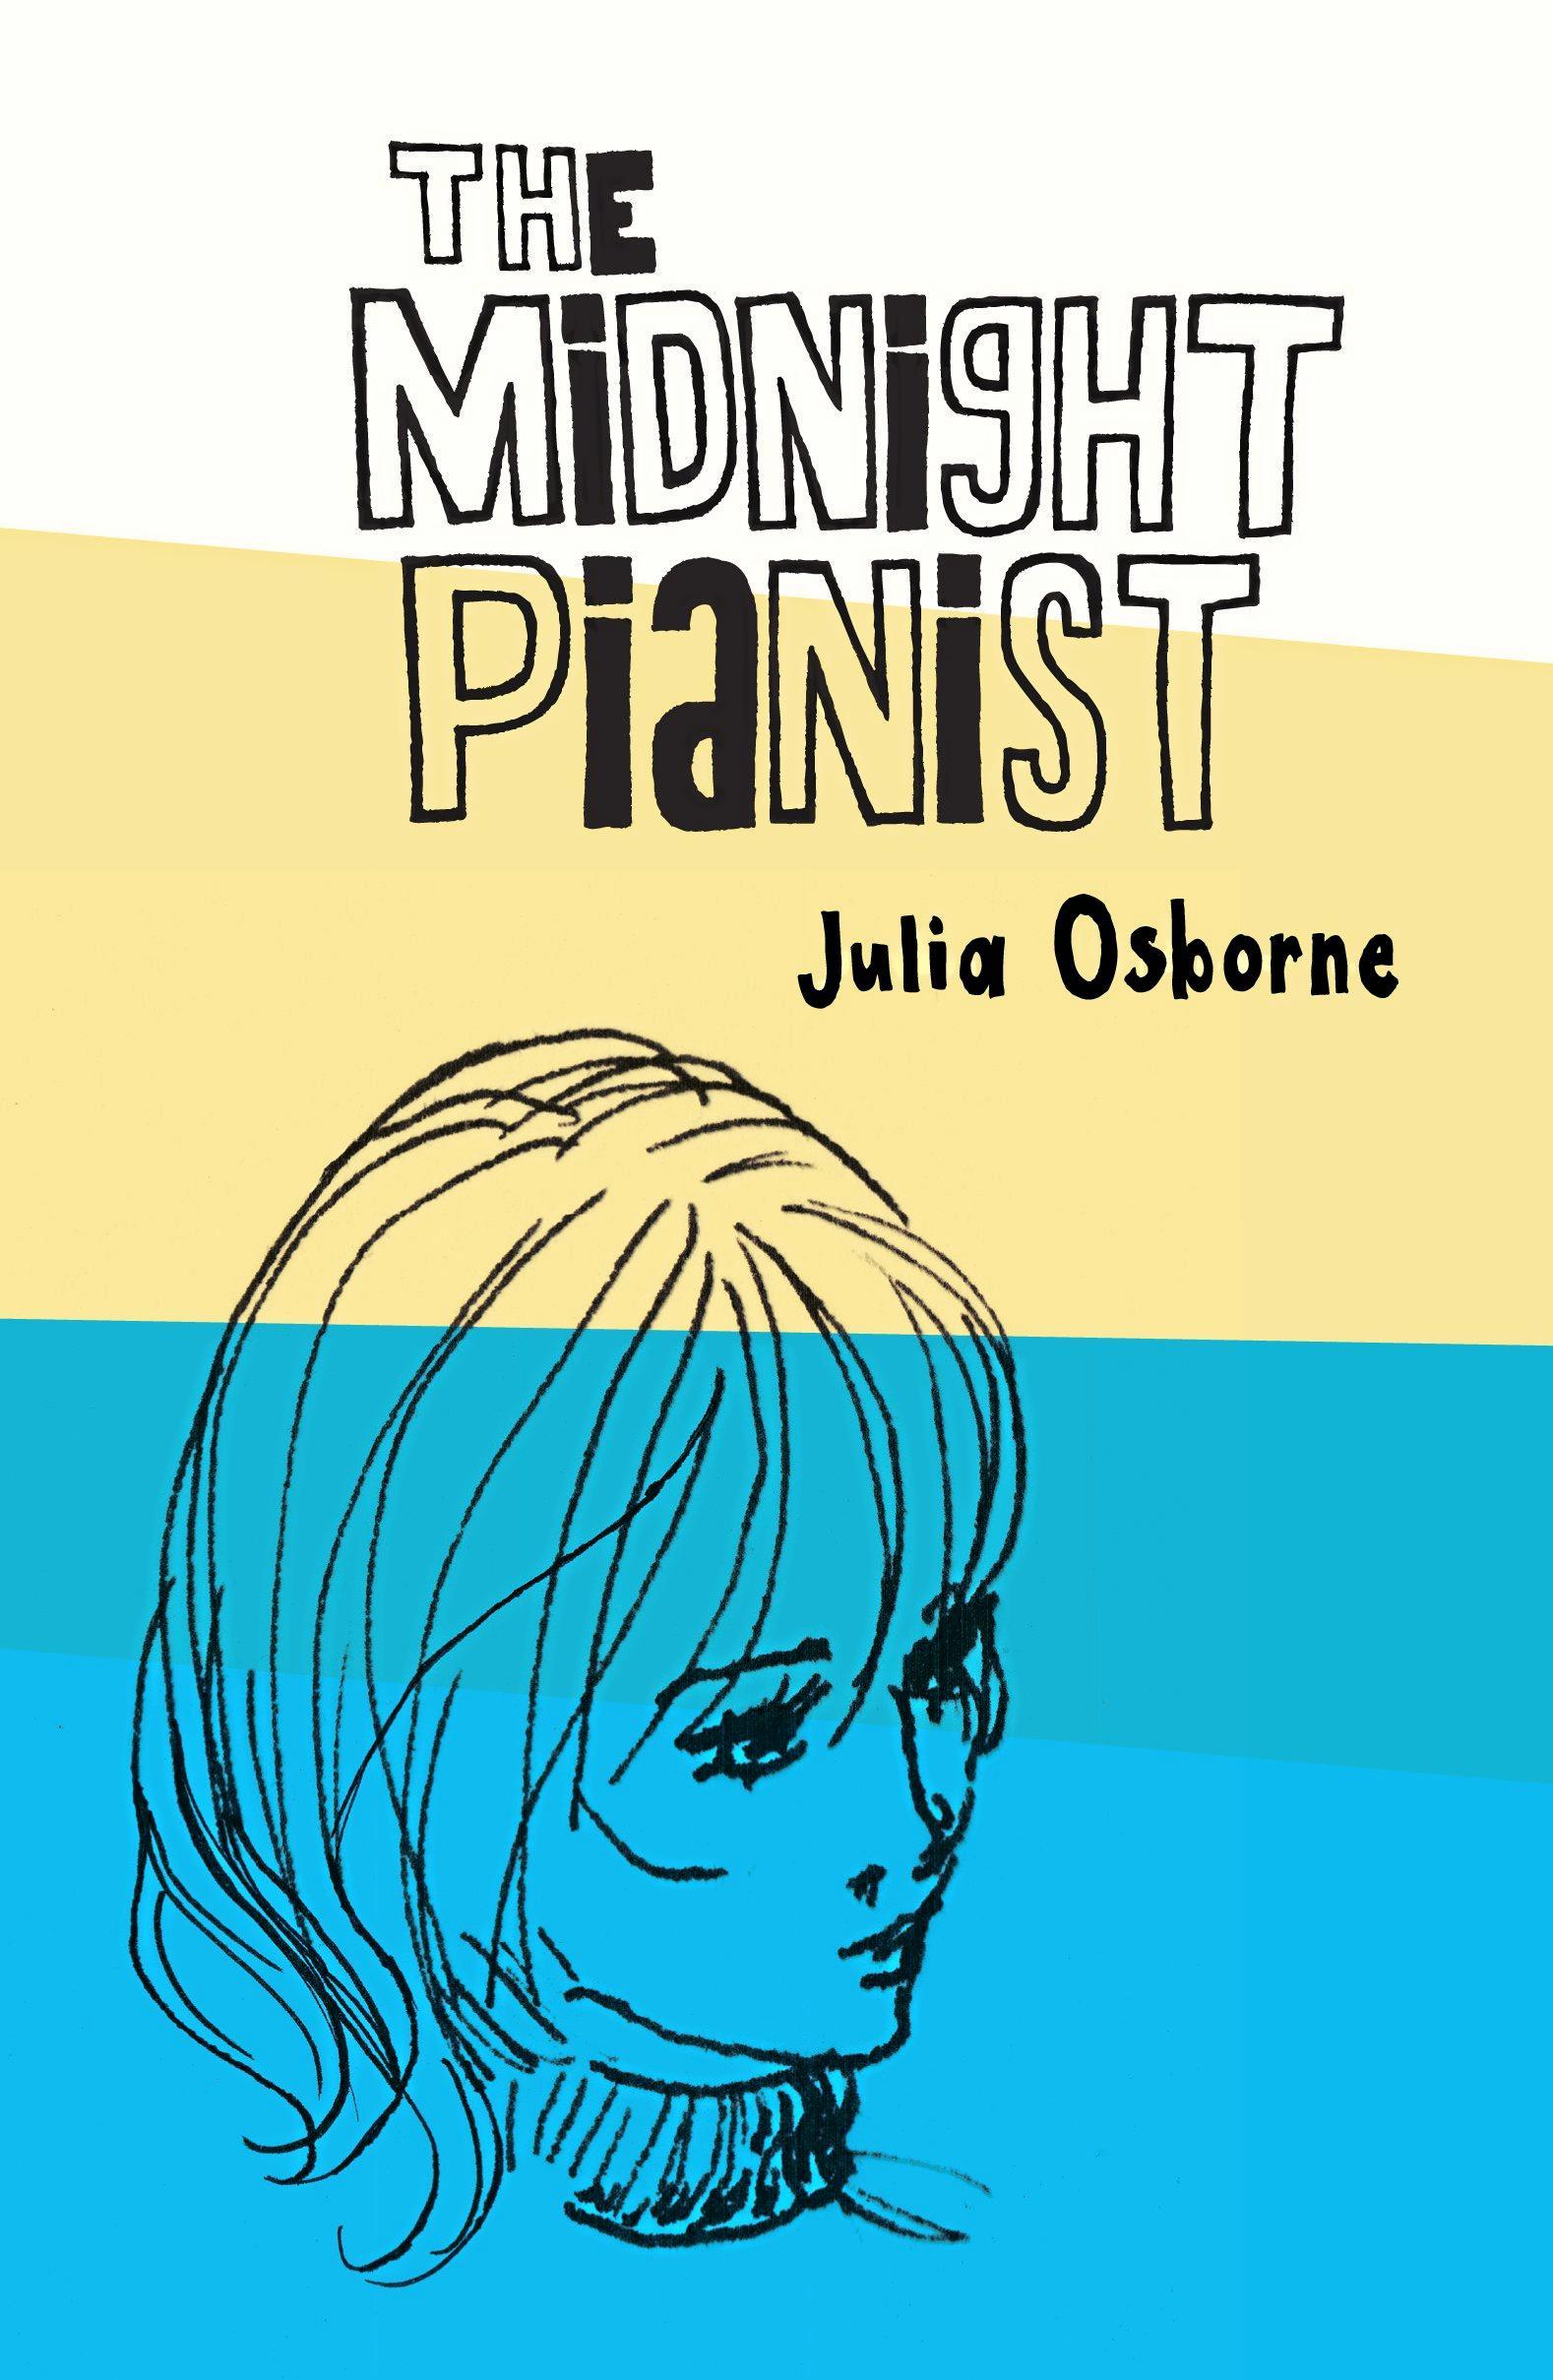 AUTHOR: Julia Osborne's The Midnight Pianist.